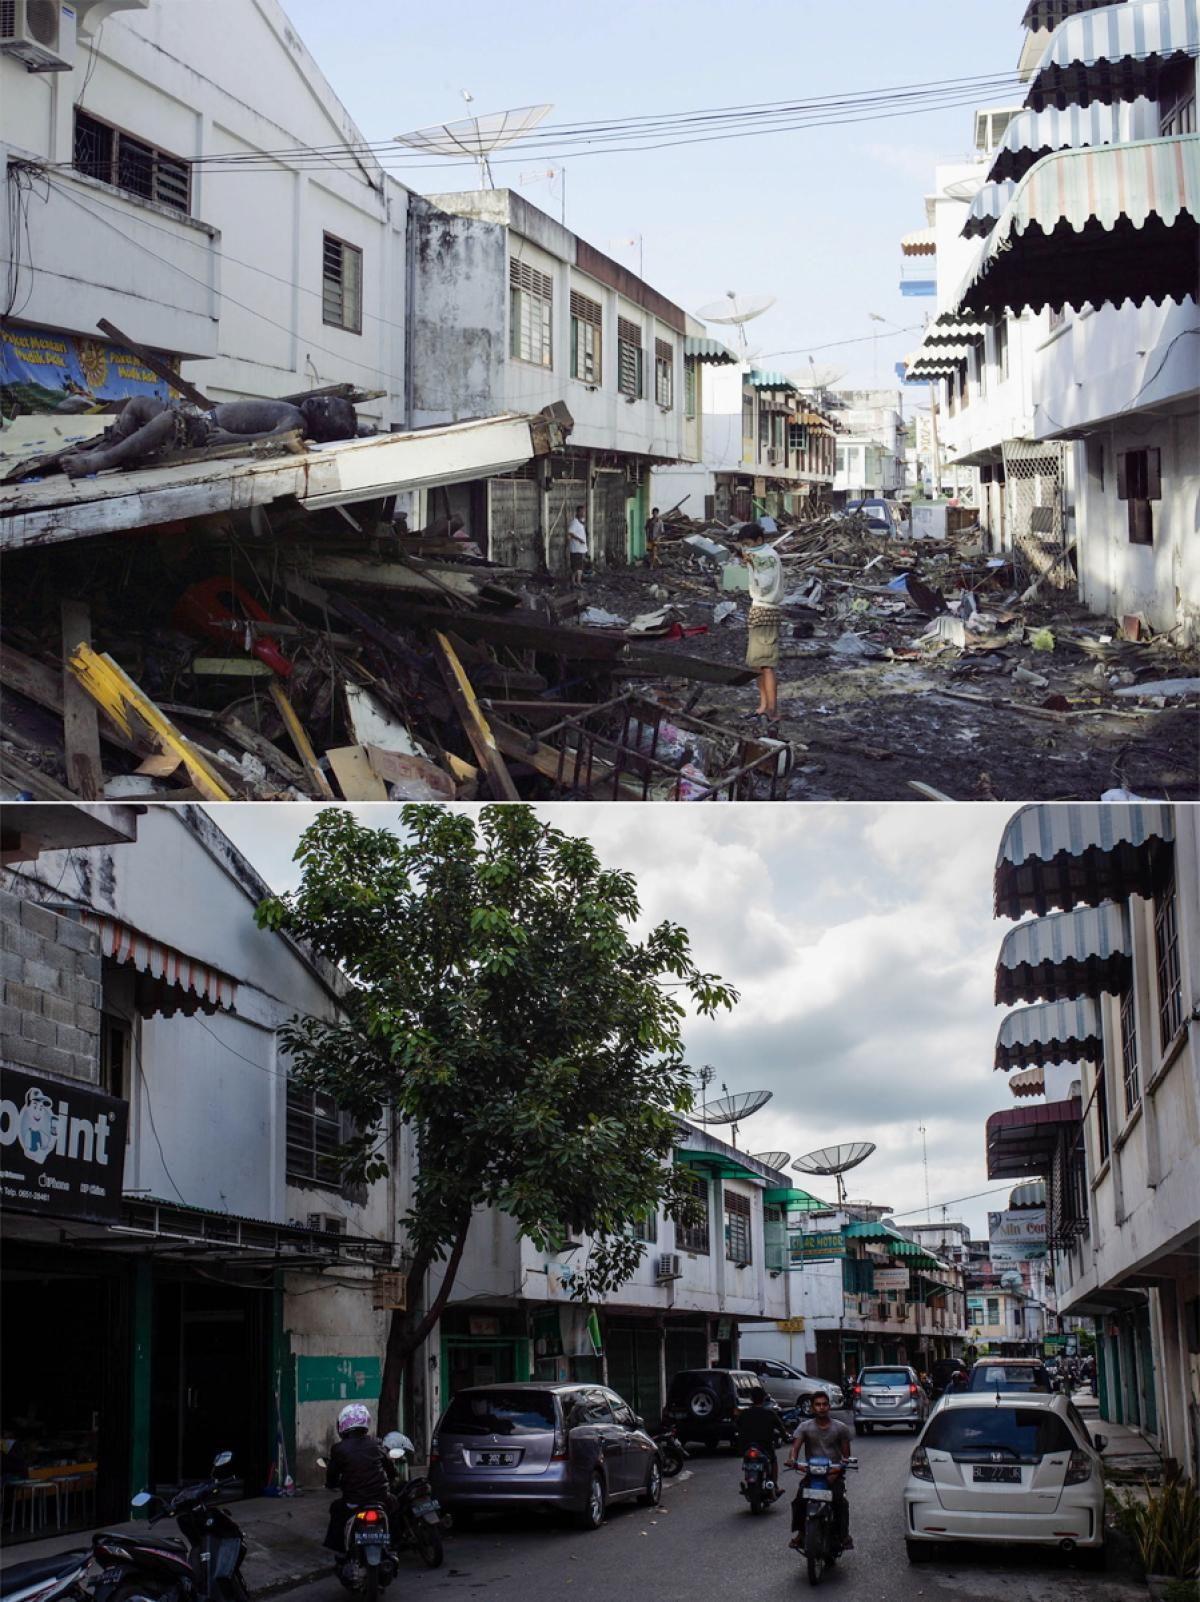 Striking Before After Shots Show Impact Of Boxing Day Tsunami 10 Years Later Indian Ocean Tsunami Ocean